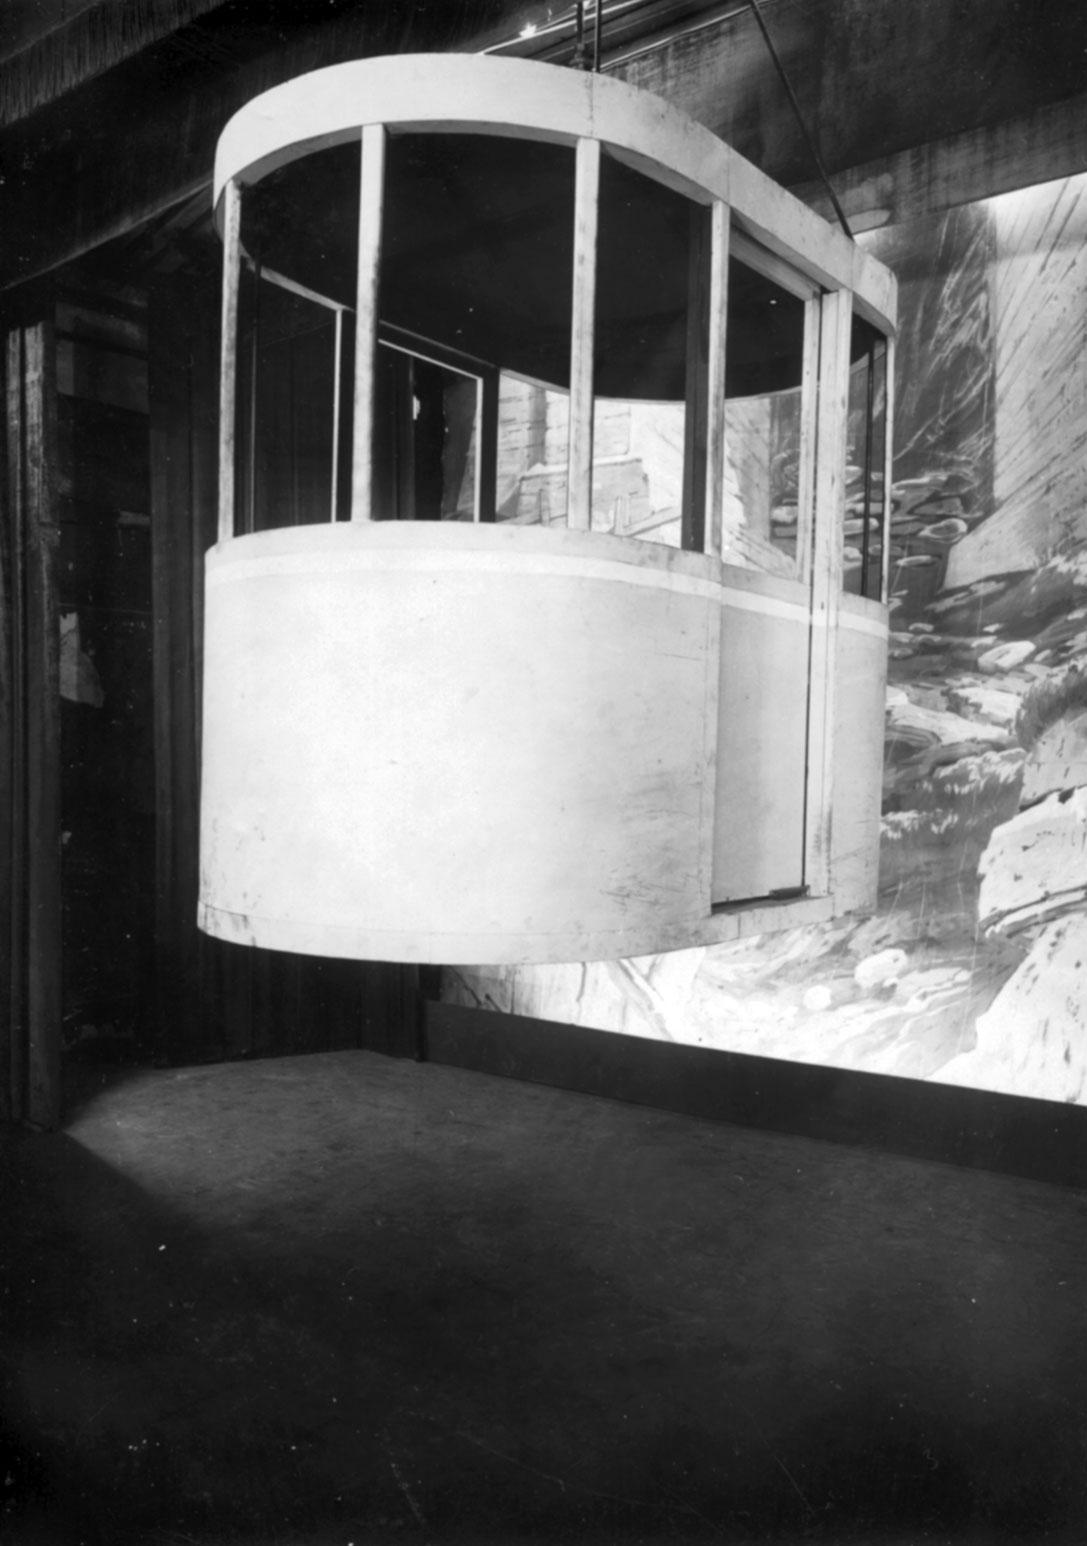 Revue 1932 ©Centre d'iconographie genevoise